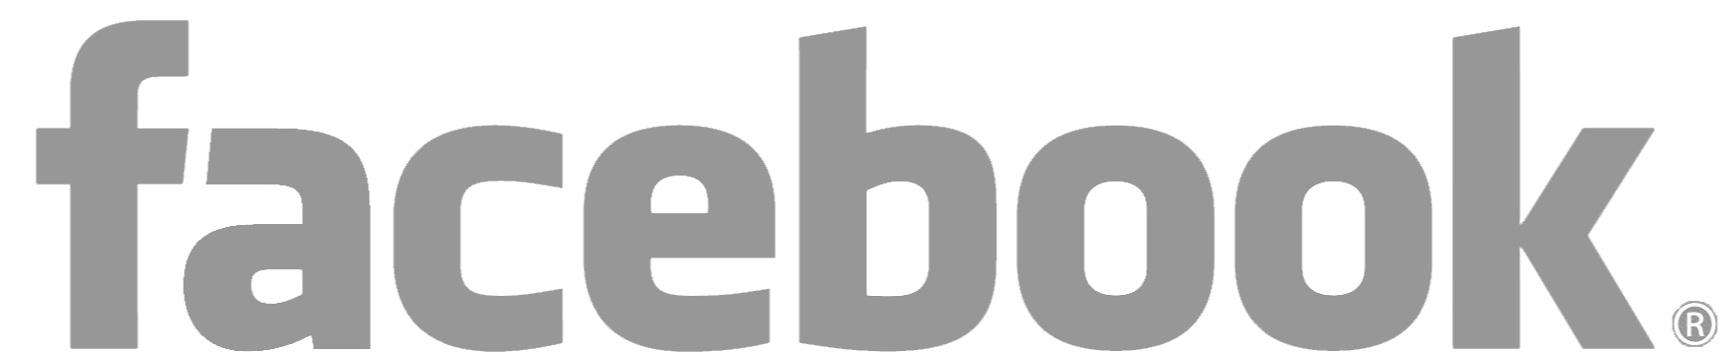 logo-facebook-png-hd-12.jpg